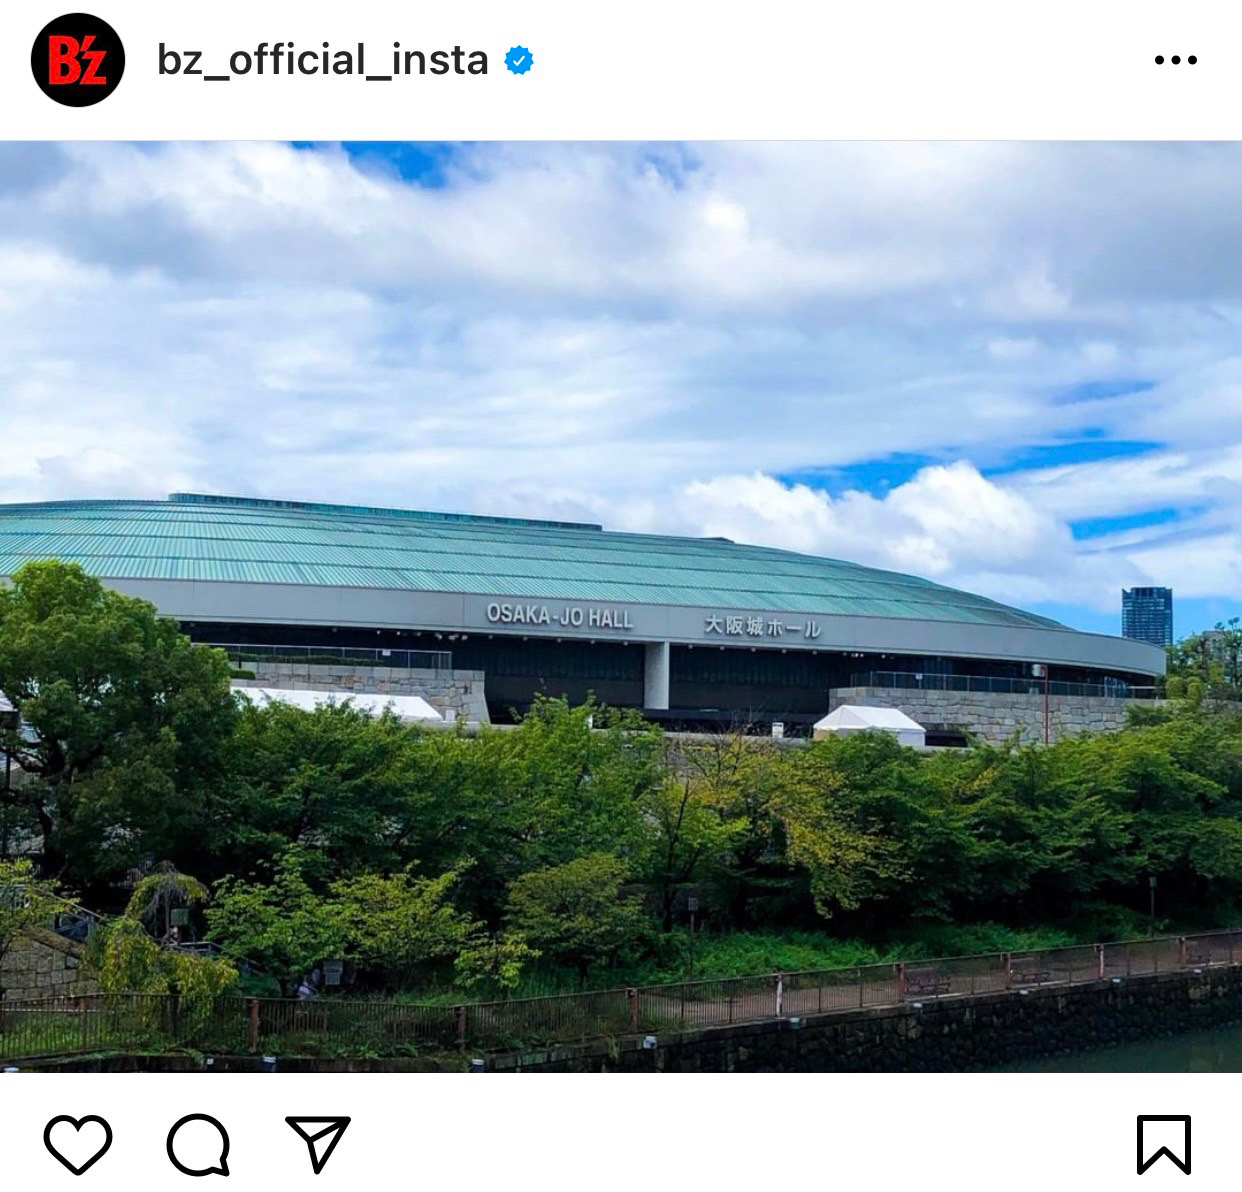 『B'z presents UNITE #01』の大阪城ホール公演1日目の外観写真